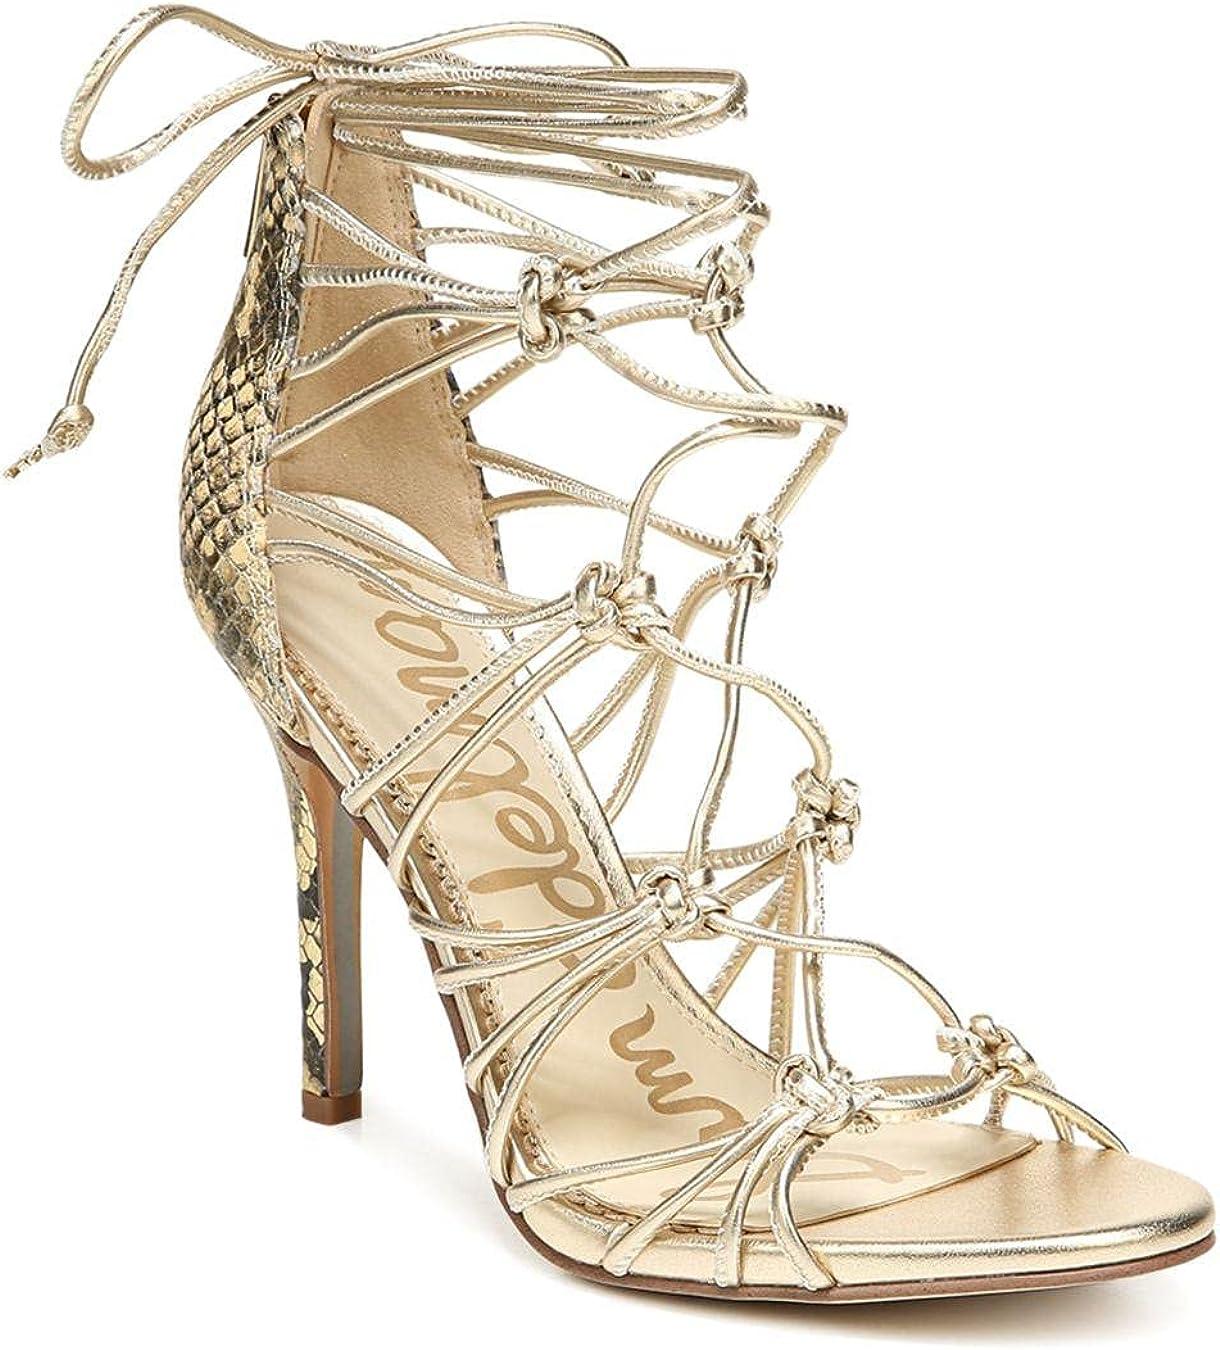 Sam Edelman Adella Metallic Ranking TOP2 Leather Caged Strappy P Gold Genuine Free Shipping Sandals